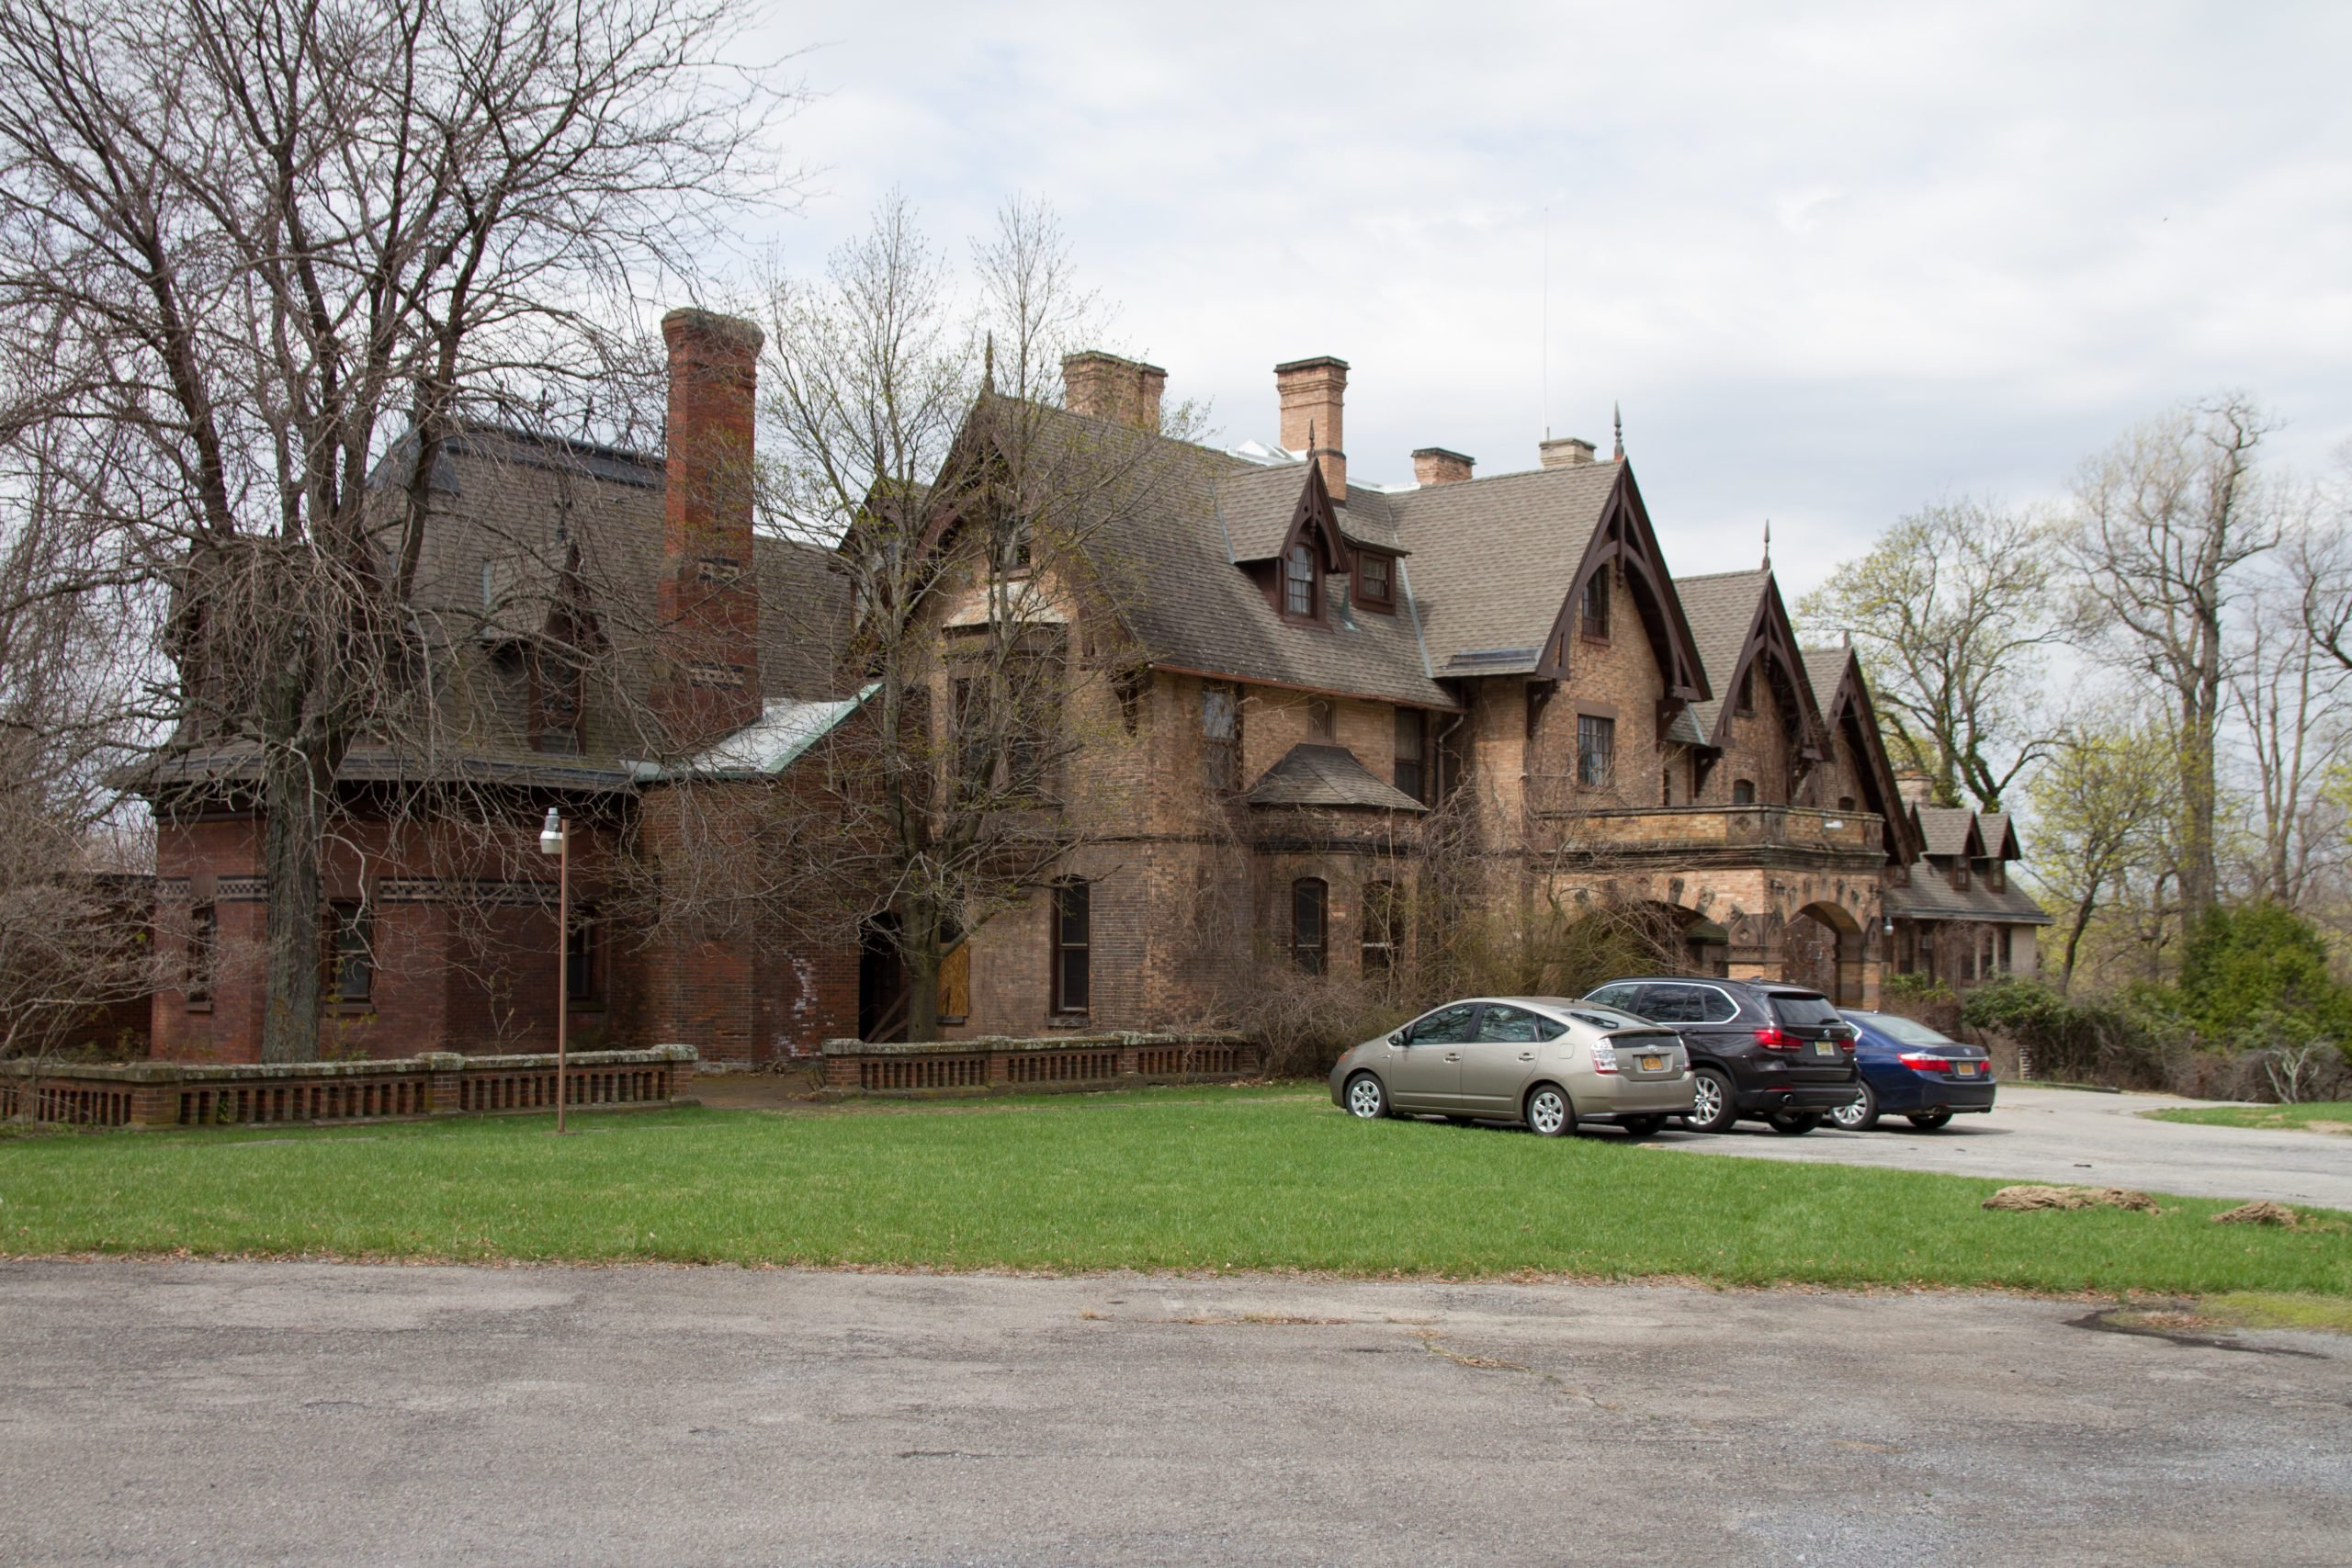 Craig house hospital abandoned mansions